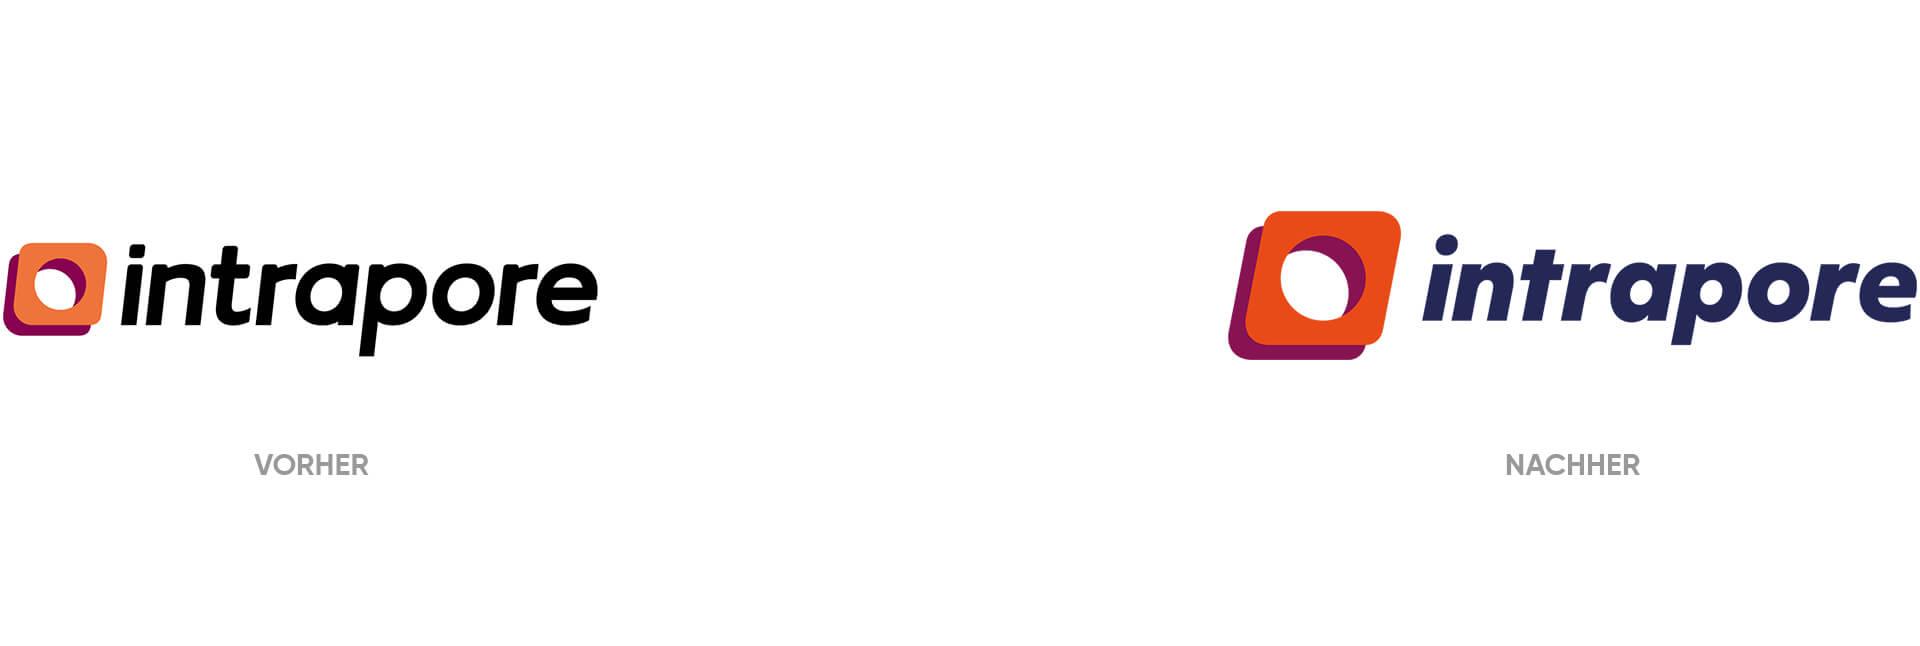 IntraporeLogos-VorherNachher-neu